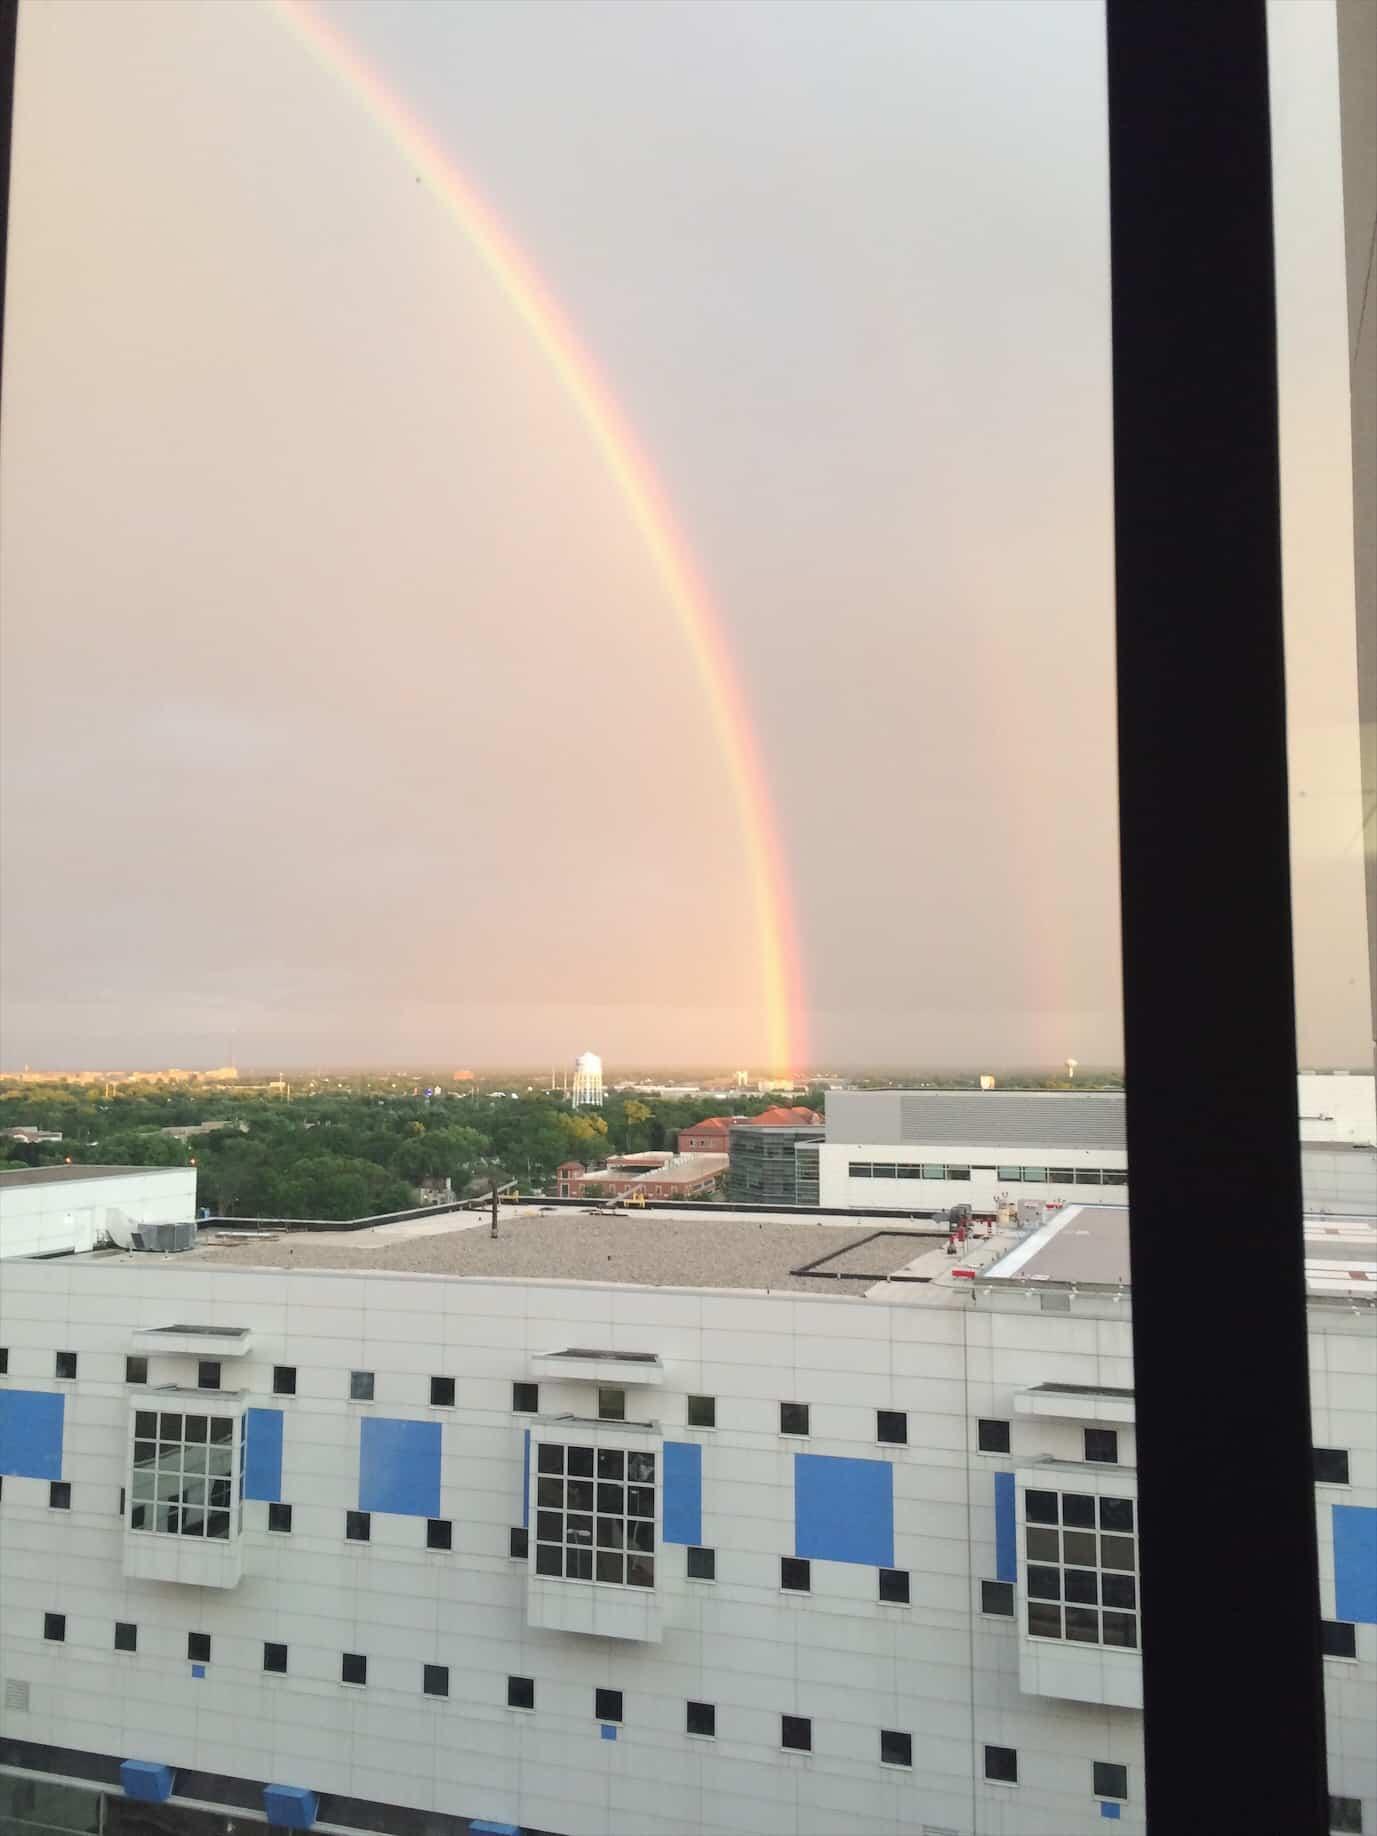 Rainbow out of hospital window